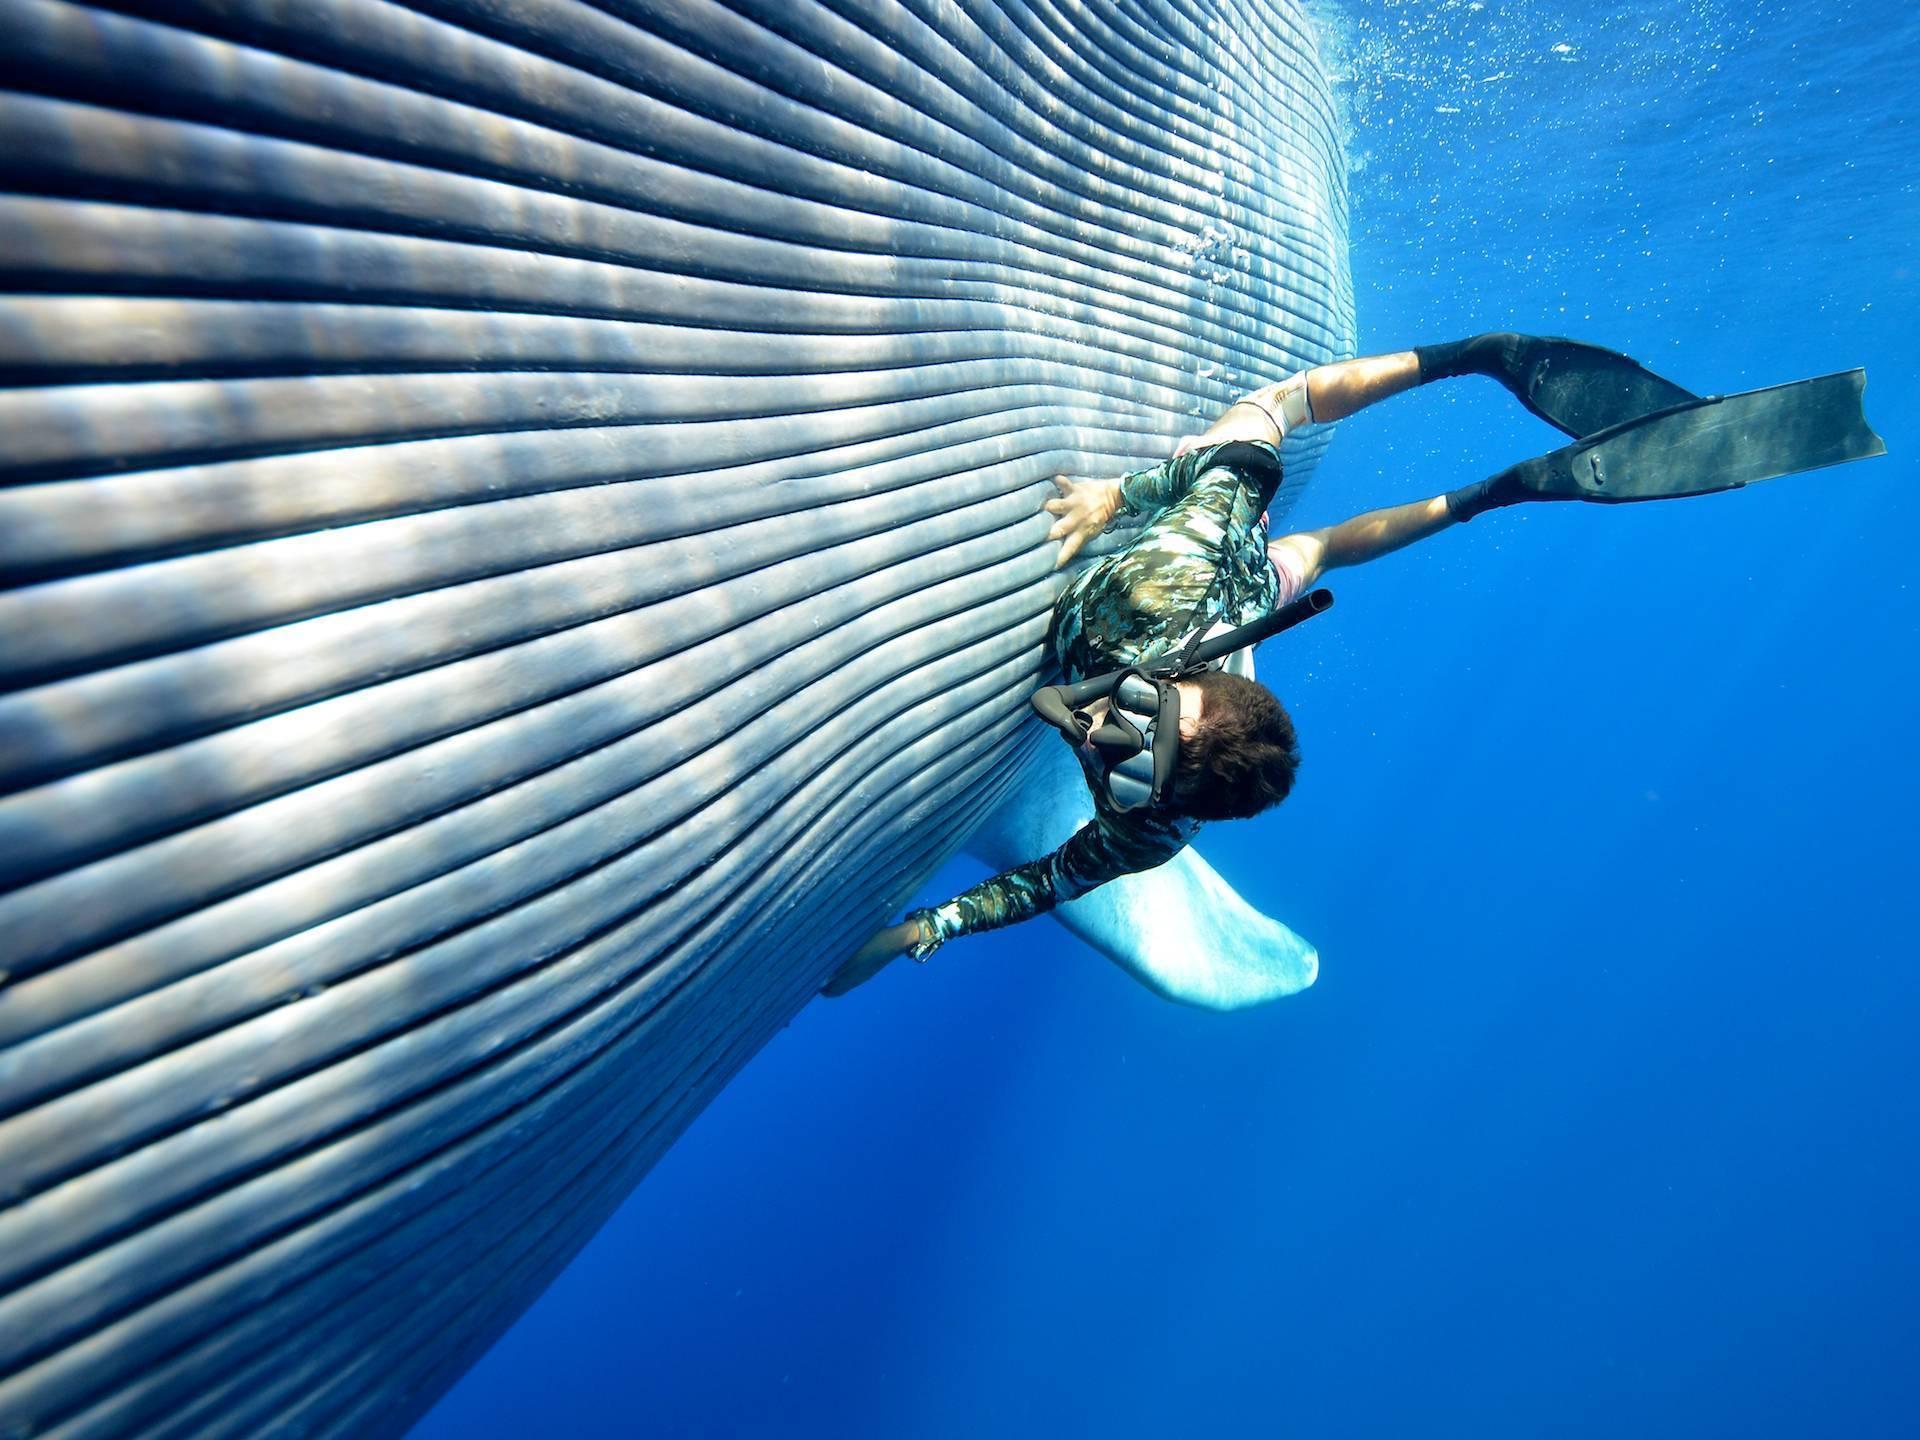 Размножение китов